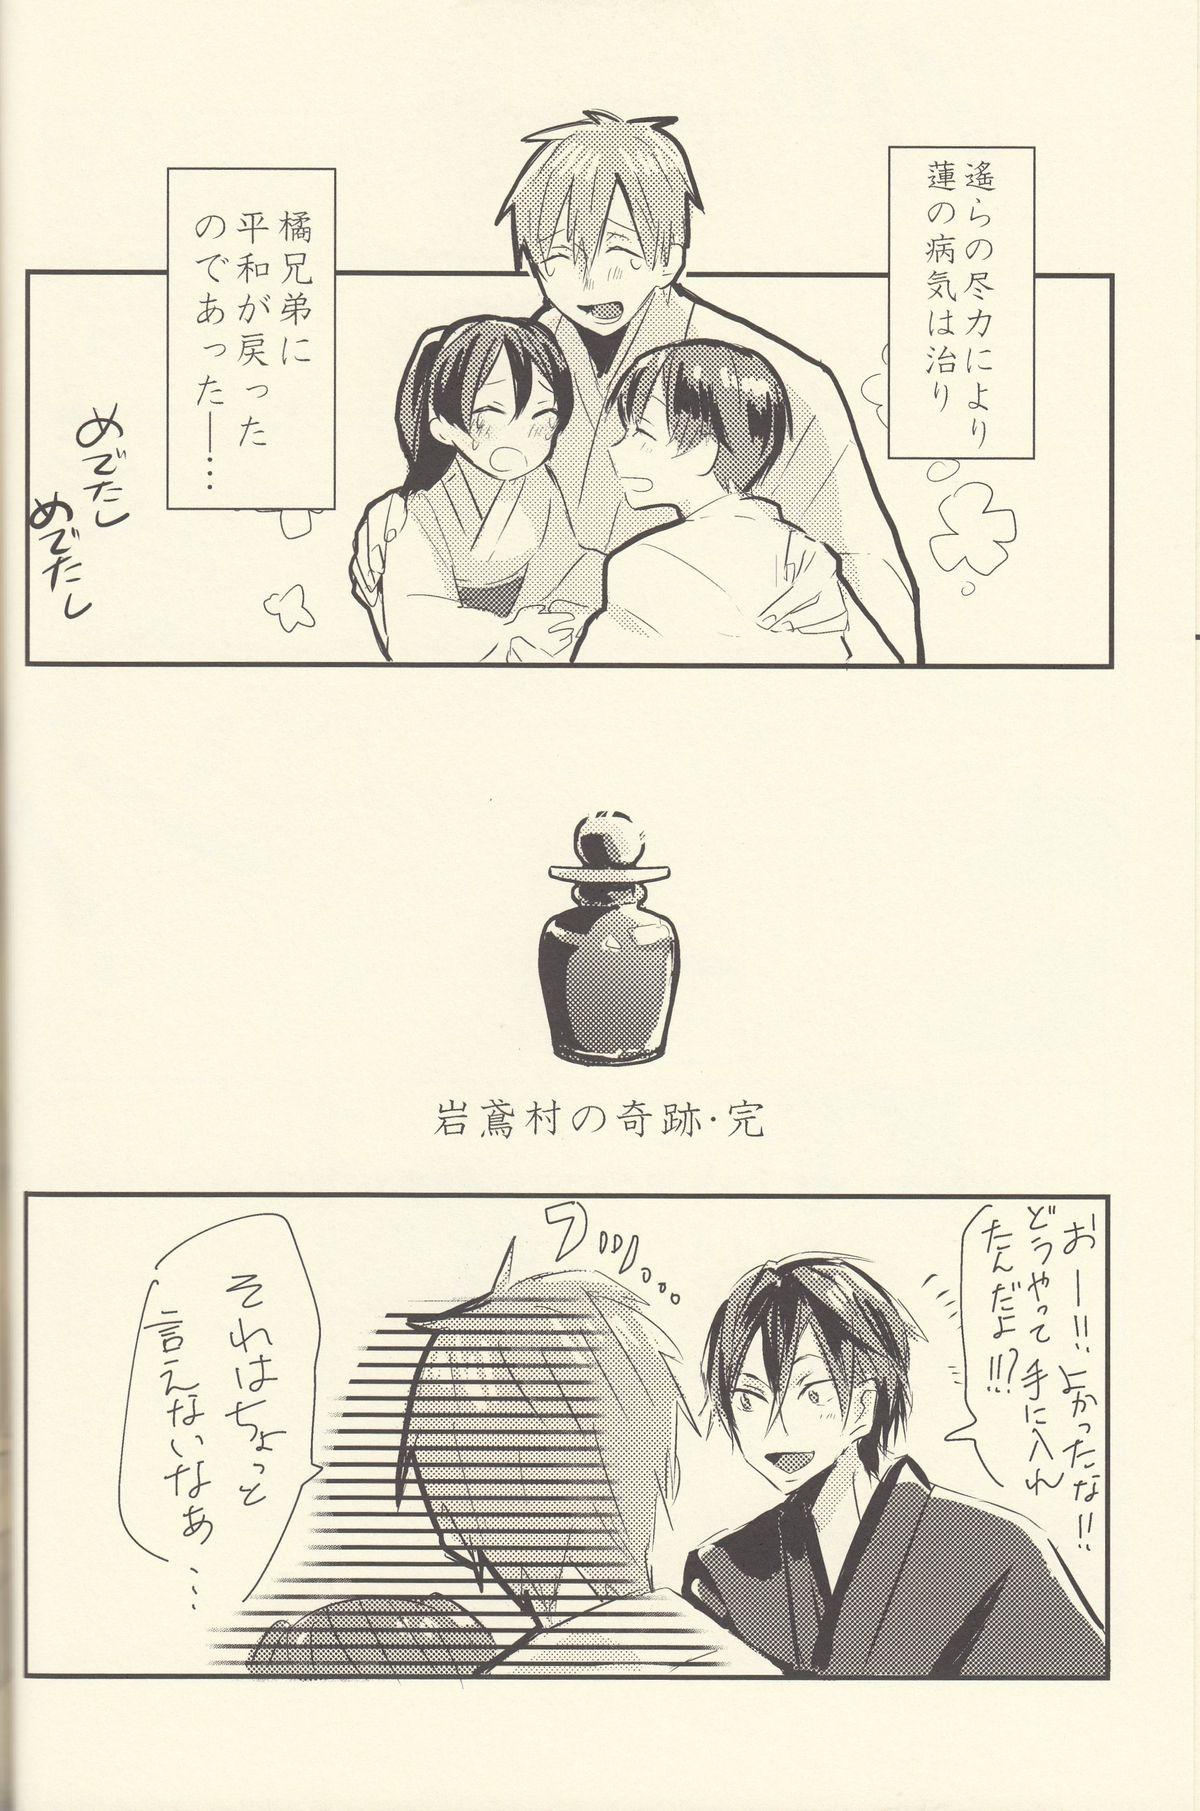 Shiofuki no Friendship - Makoto ♥ Haruka Squirting Anthology 23